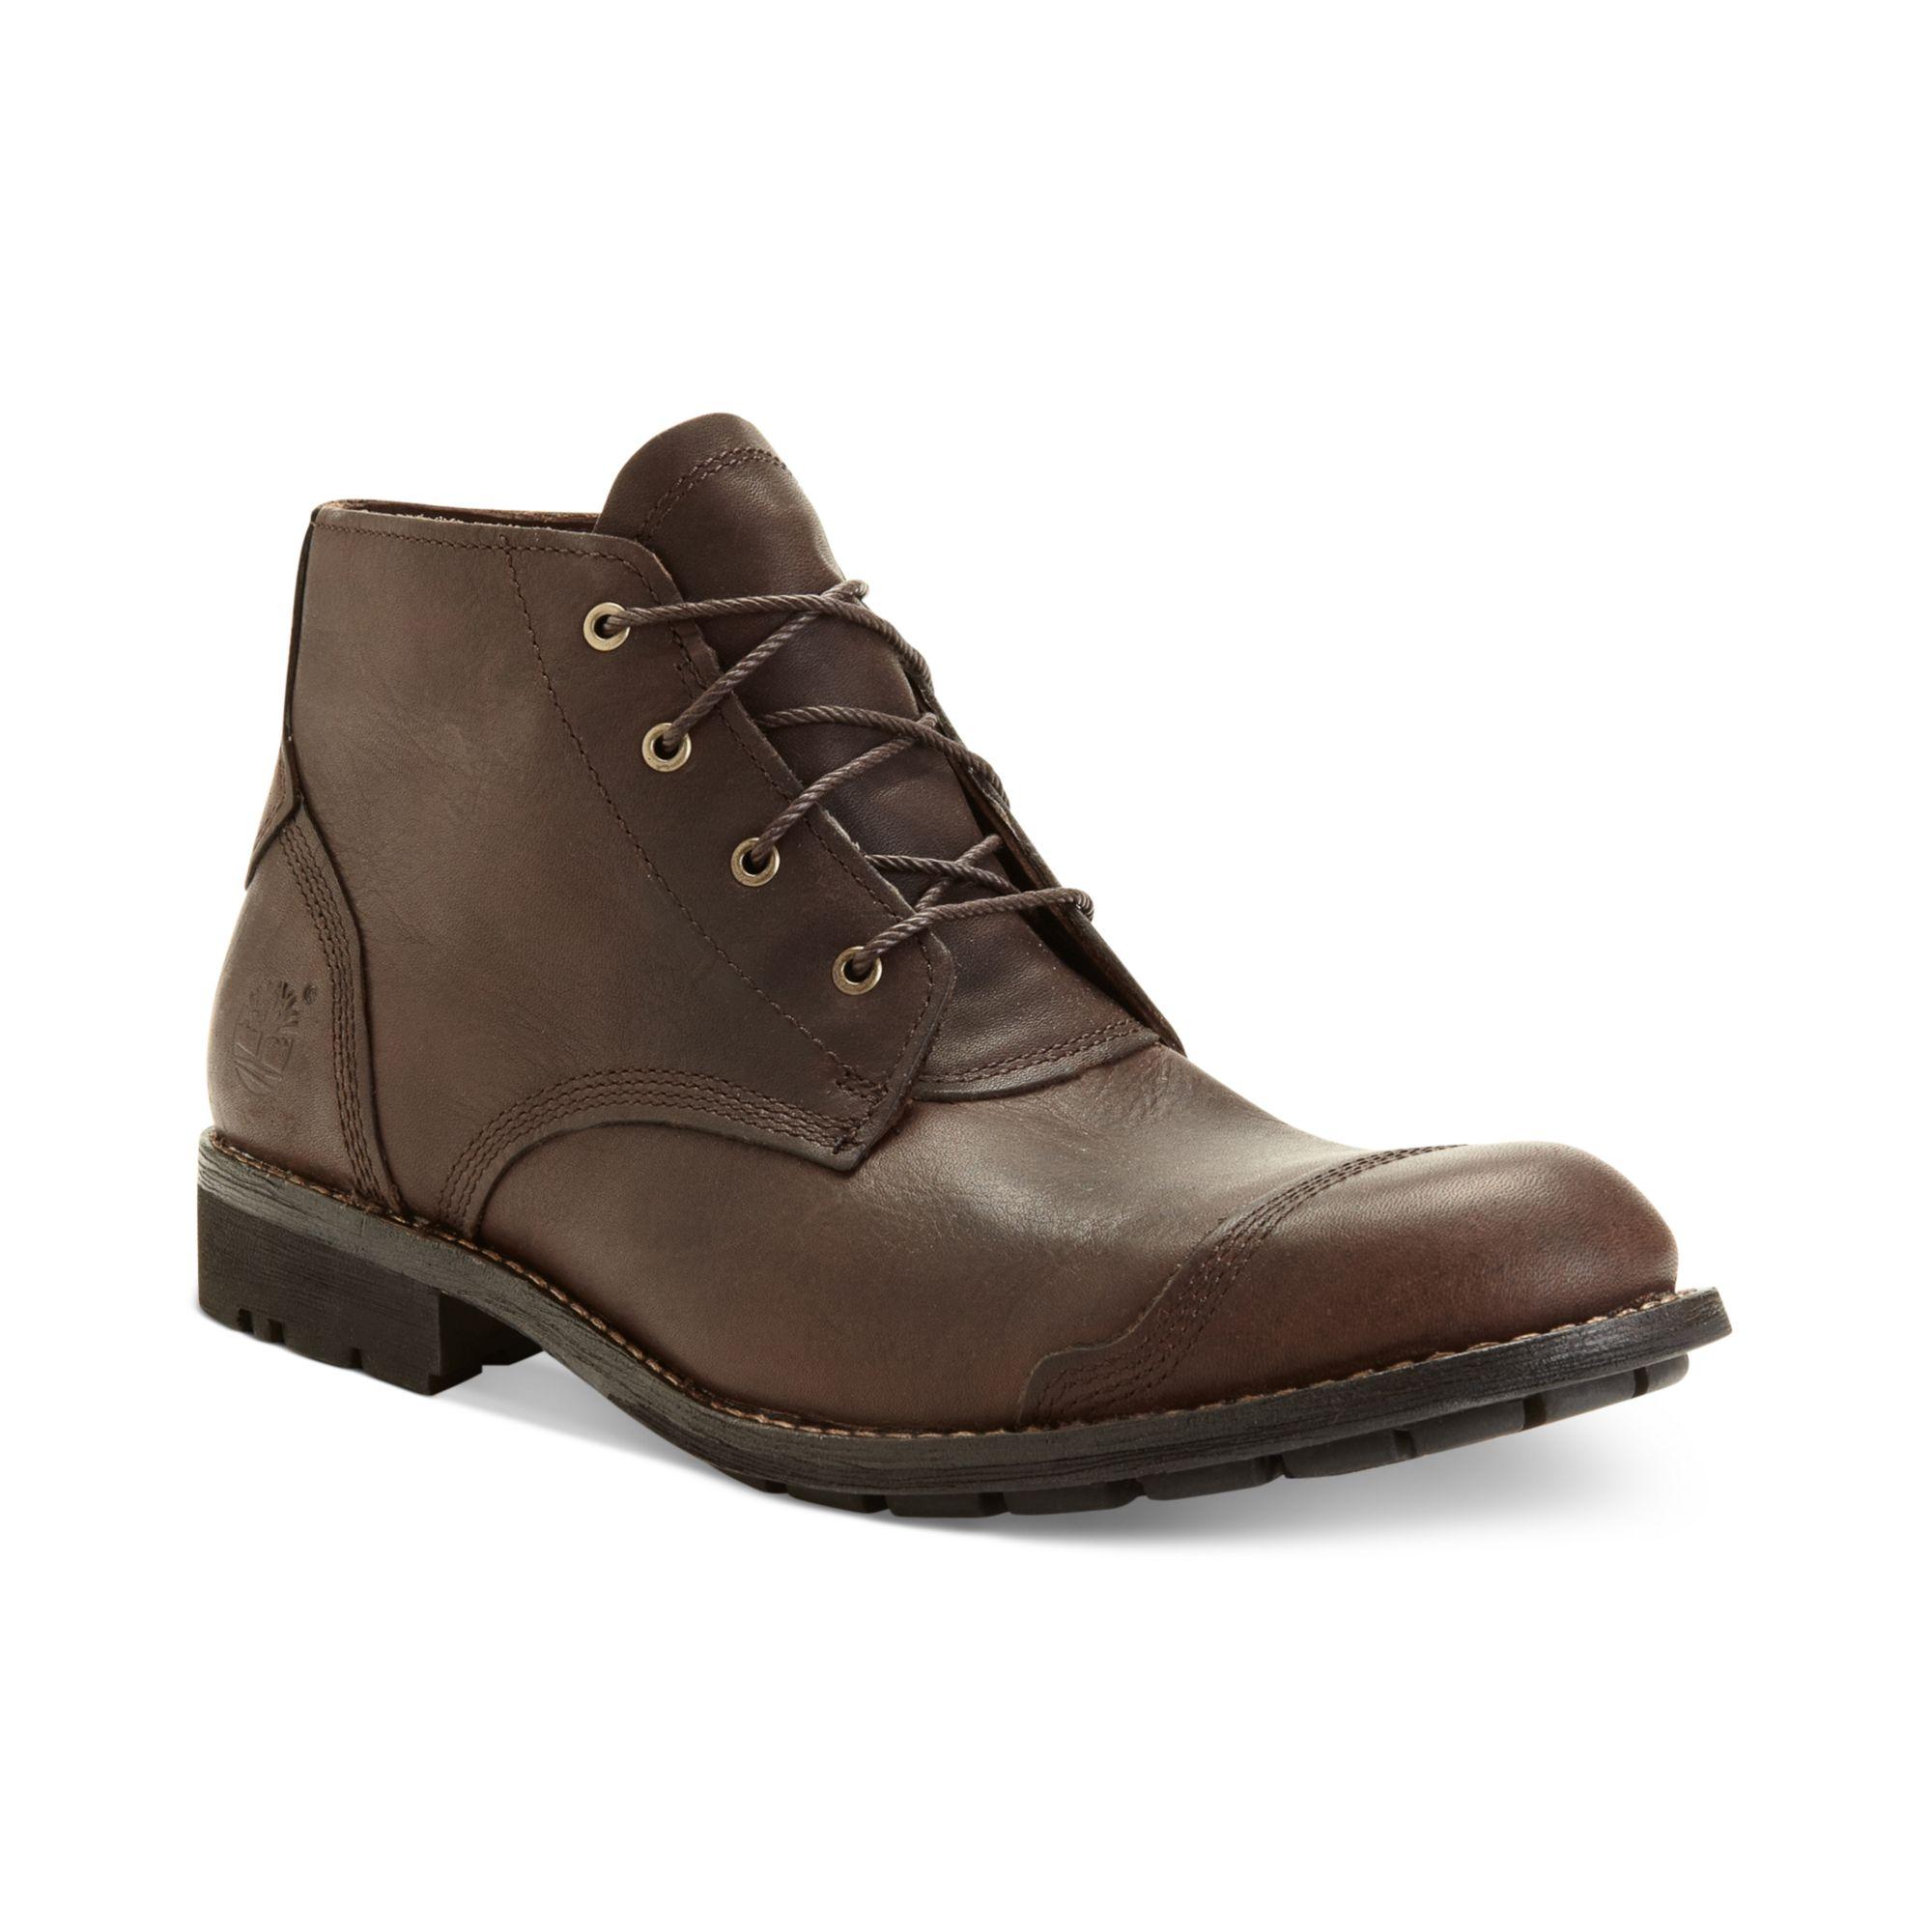 timberland earthkeepers city chukka boots brown